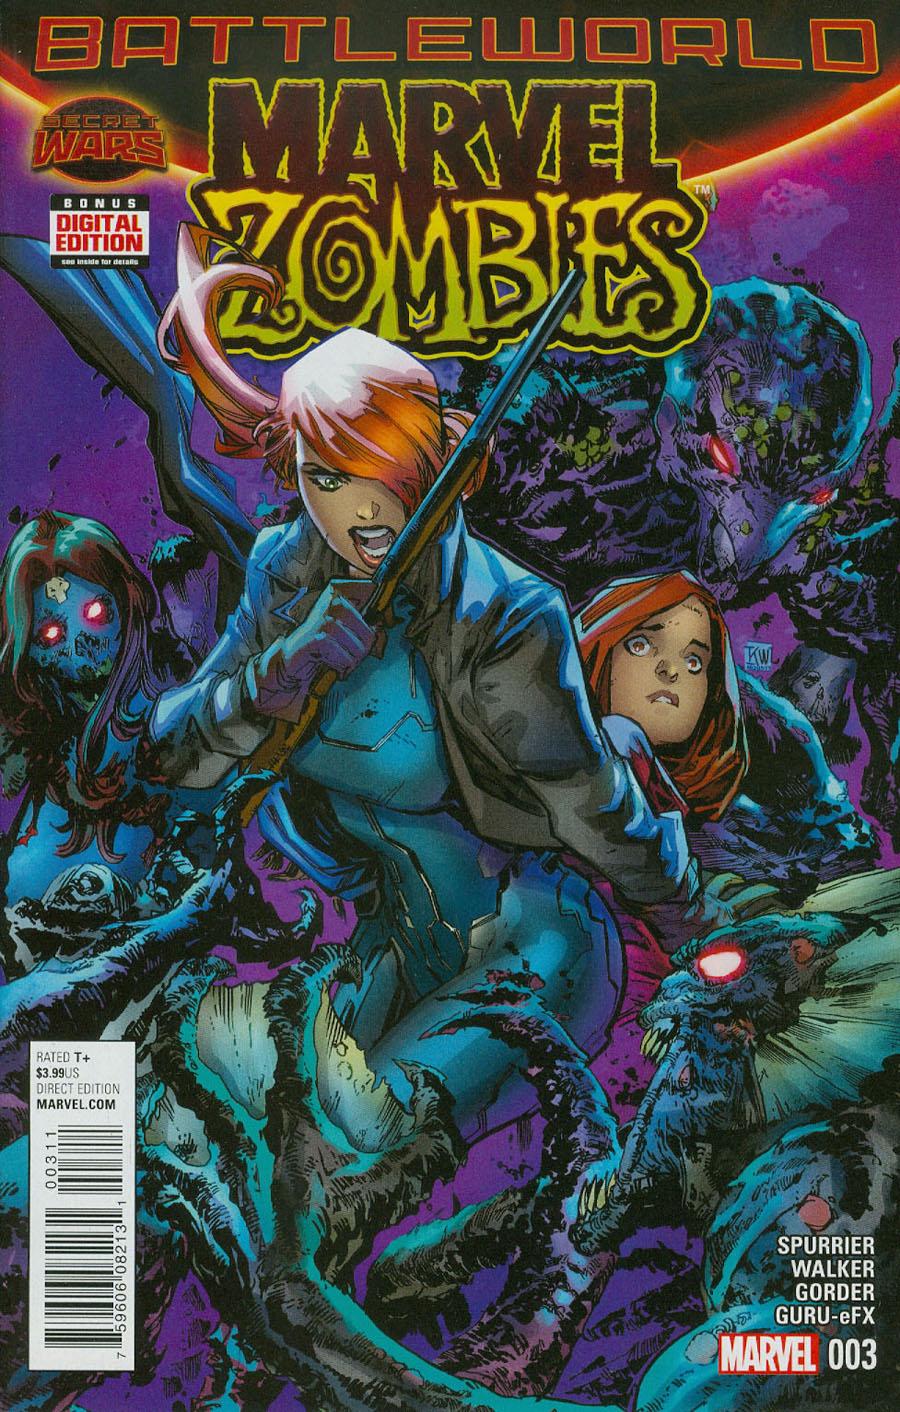 Marvel Zombies Vol 6 #3 Cover A Regular Ken Lashley Cover (Secret Wars Battleworld Tie-In)